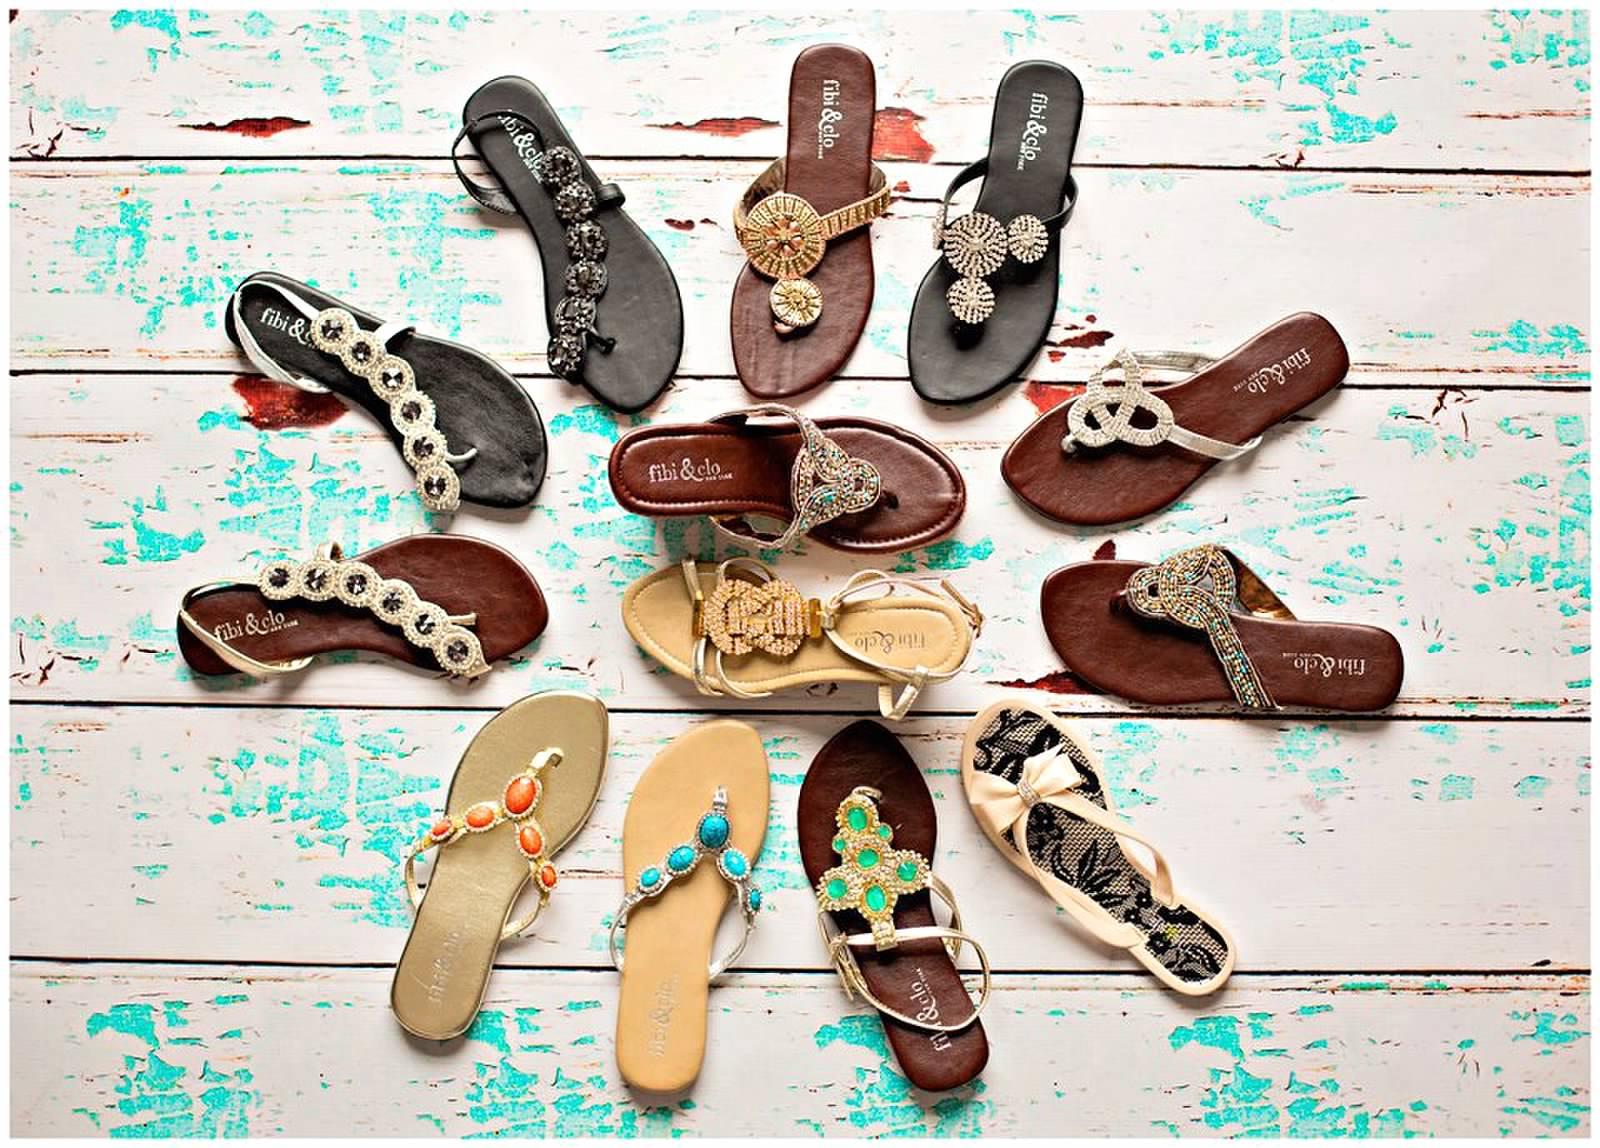 ffd5a9c1b71bf Theresa Rose Designs  Expanding My Business - fibi   clo Sandals